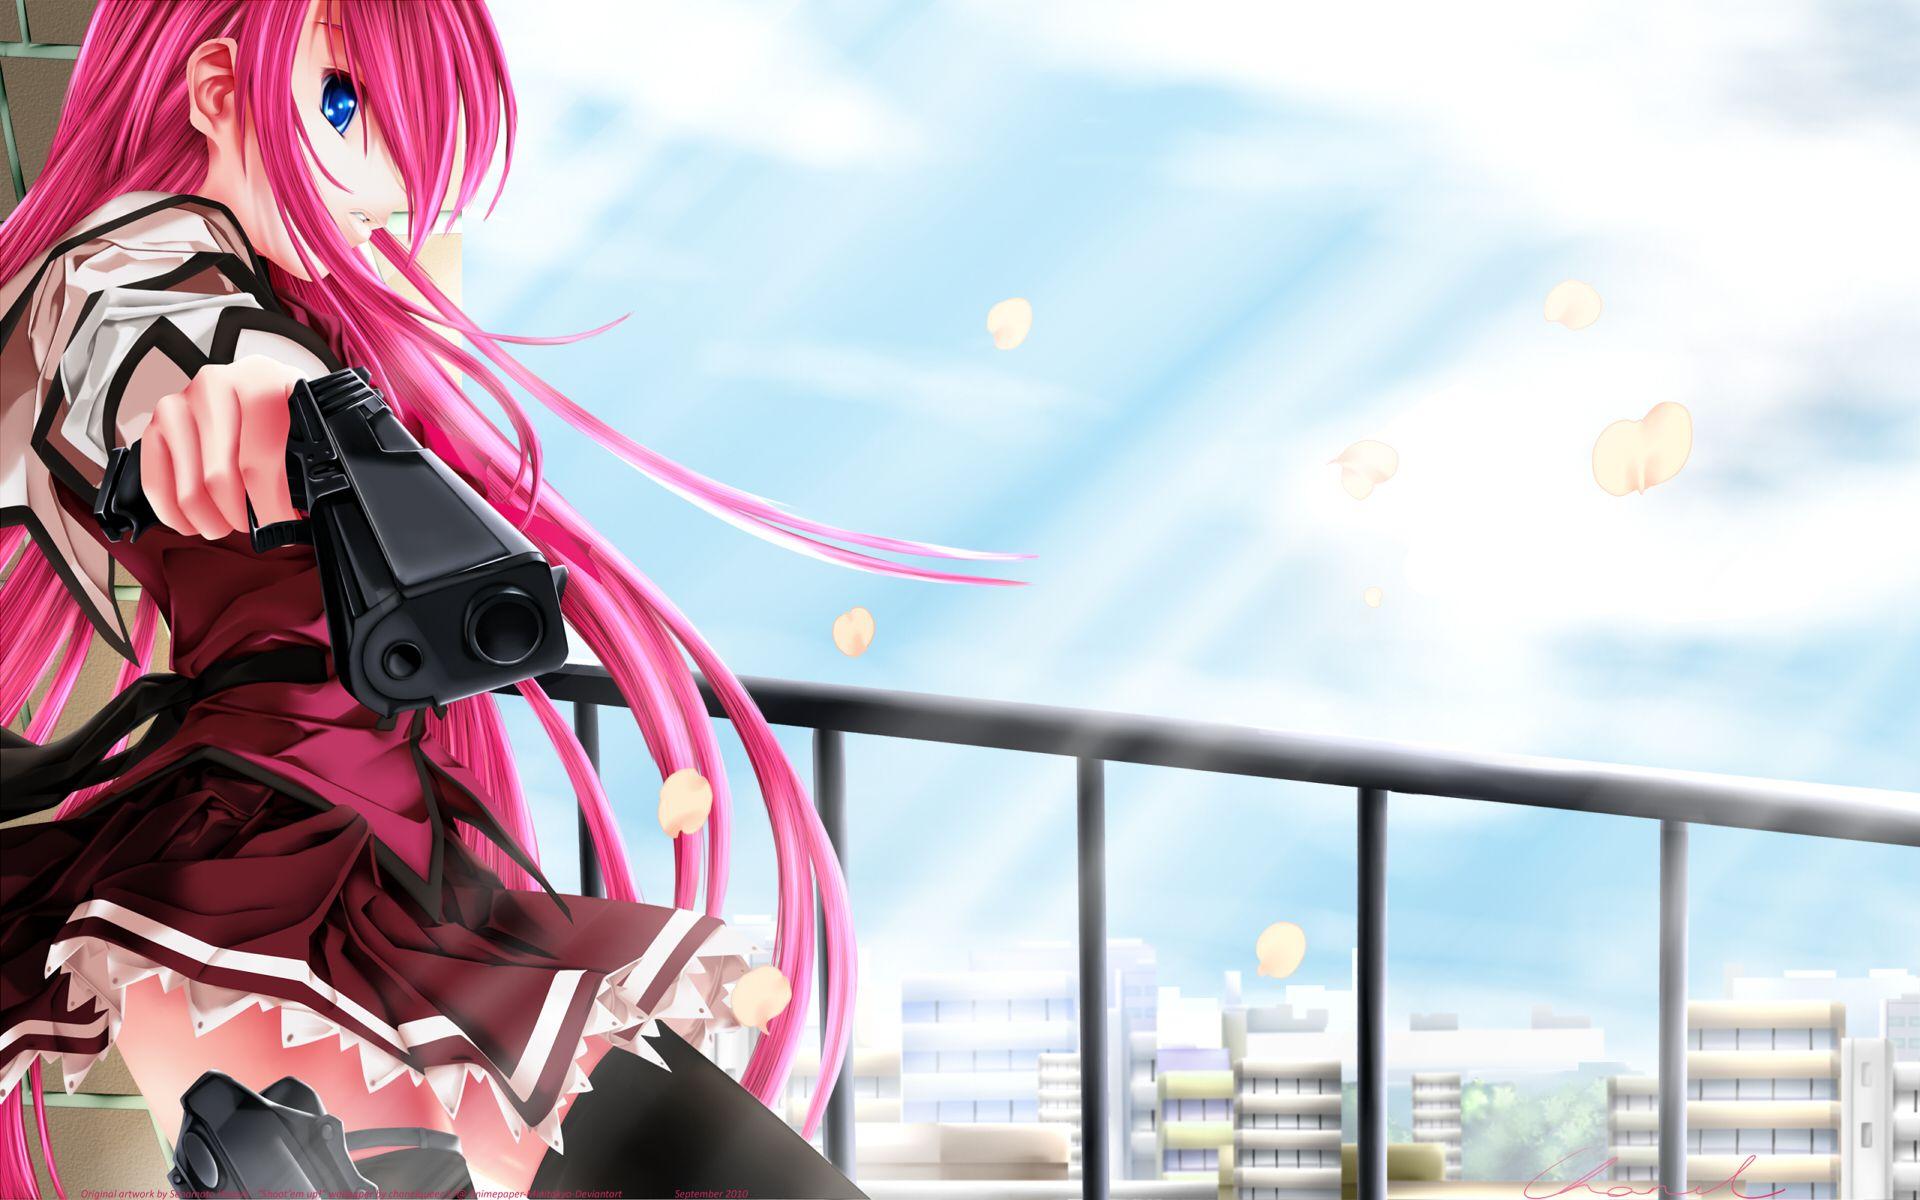 Anime Girl With Gun Hd Wallpaper